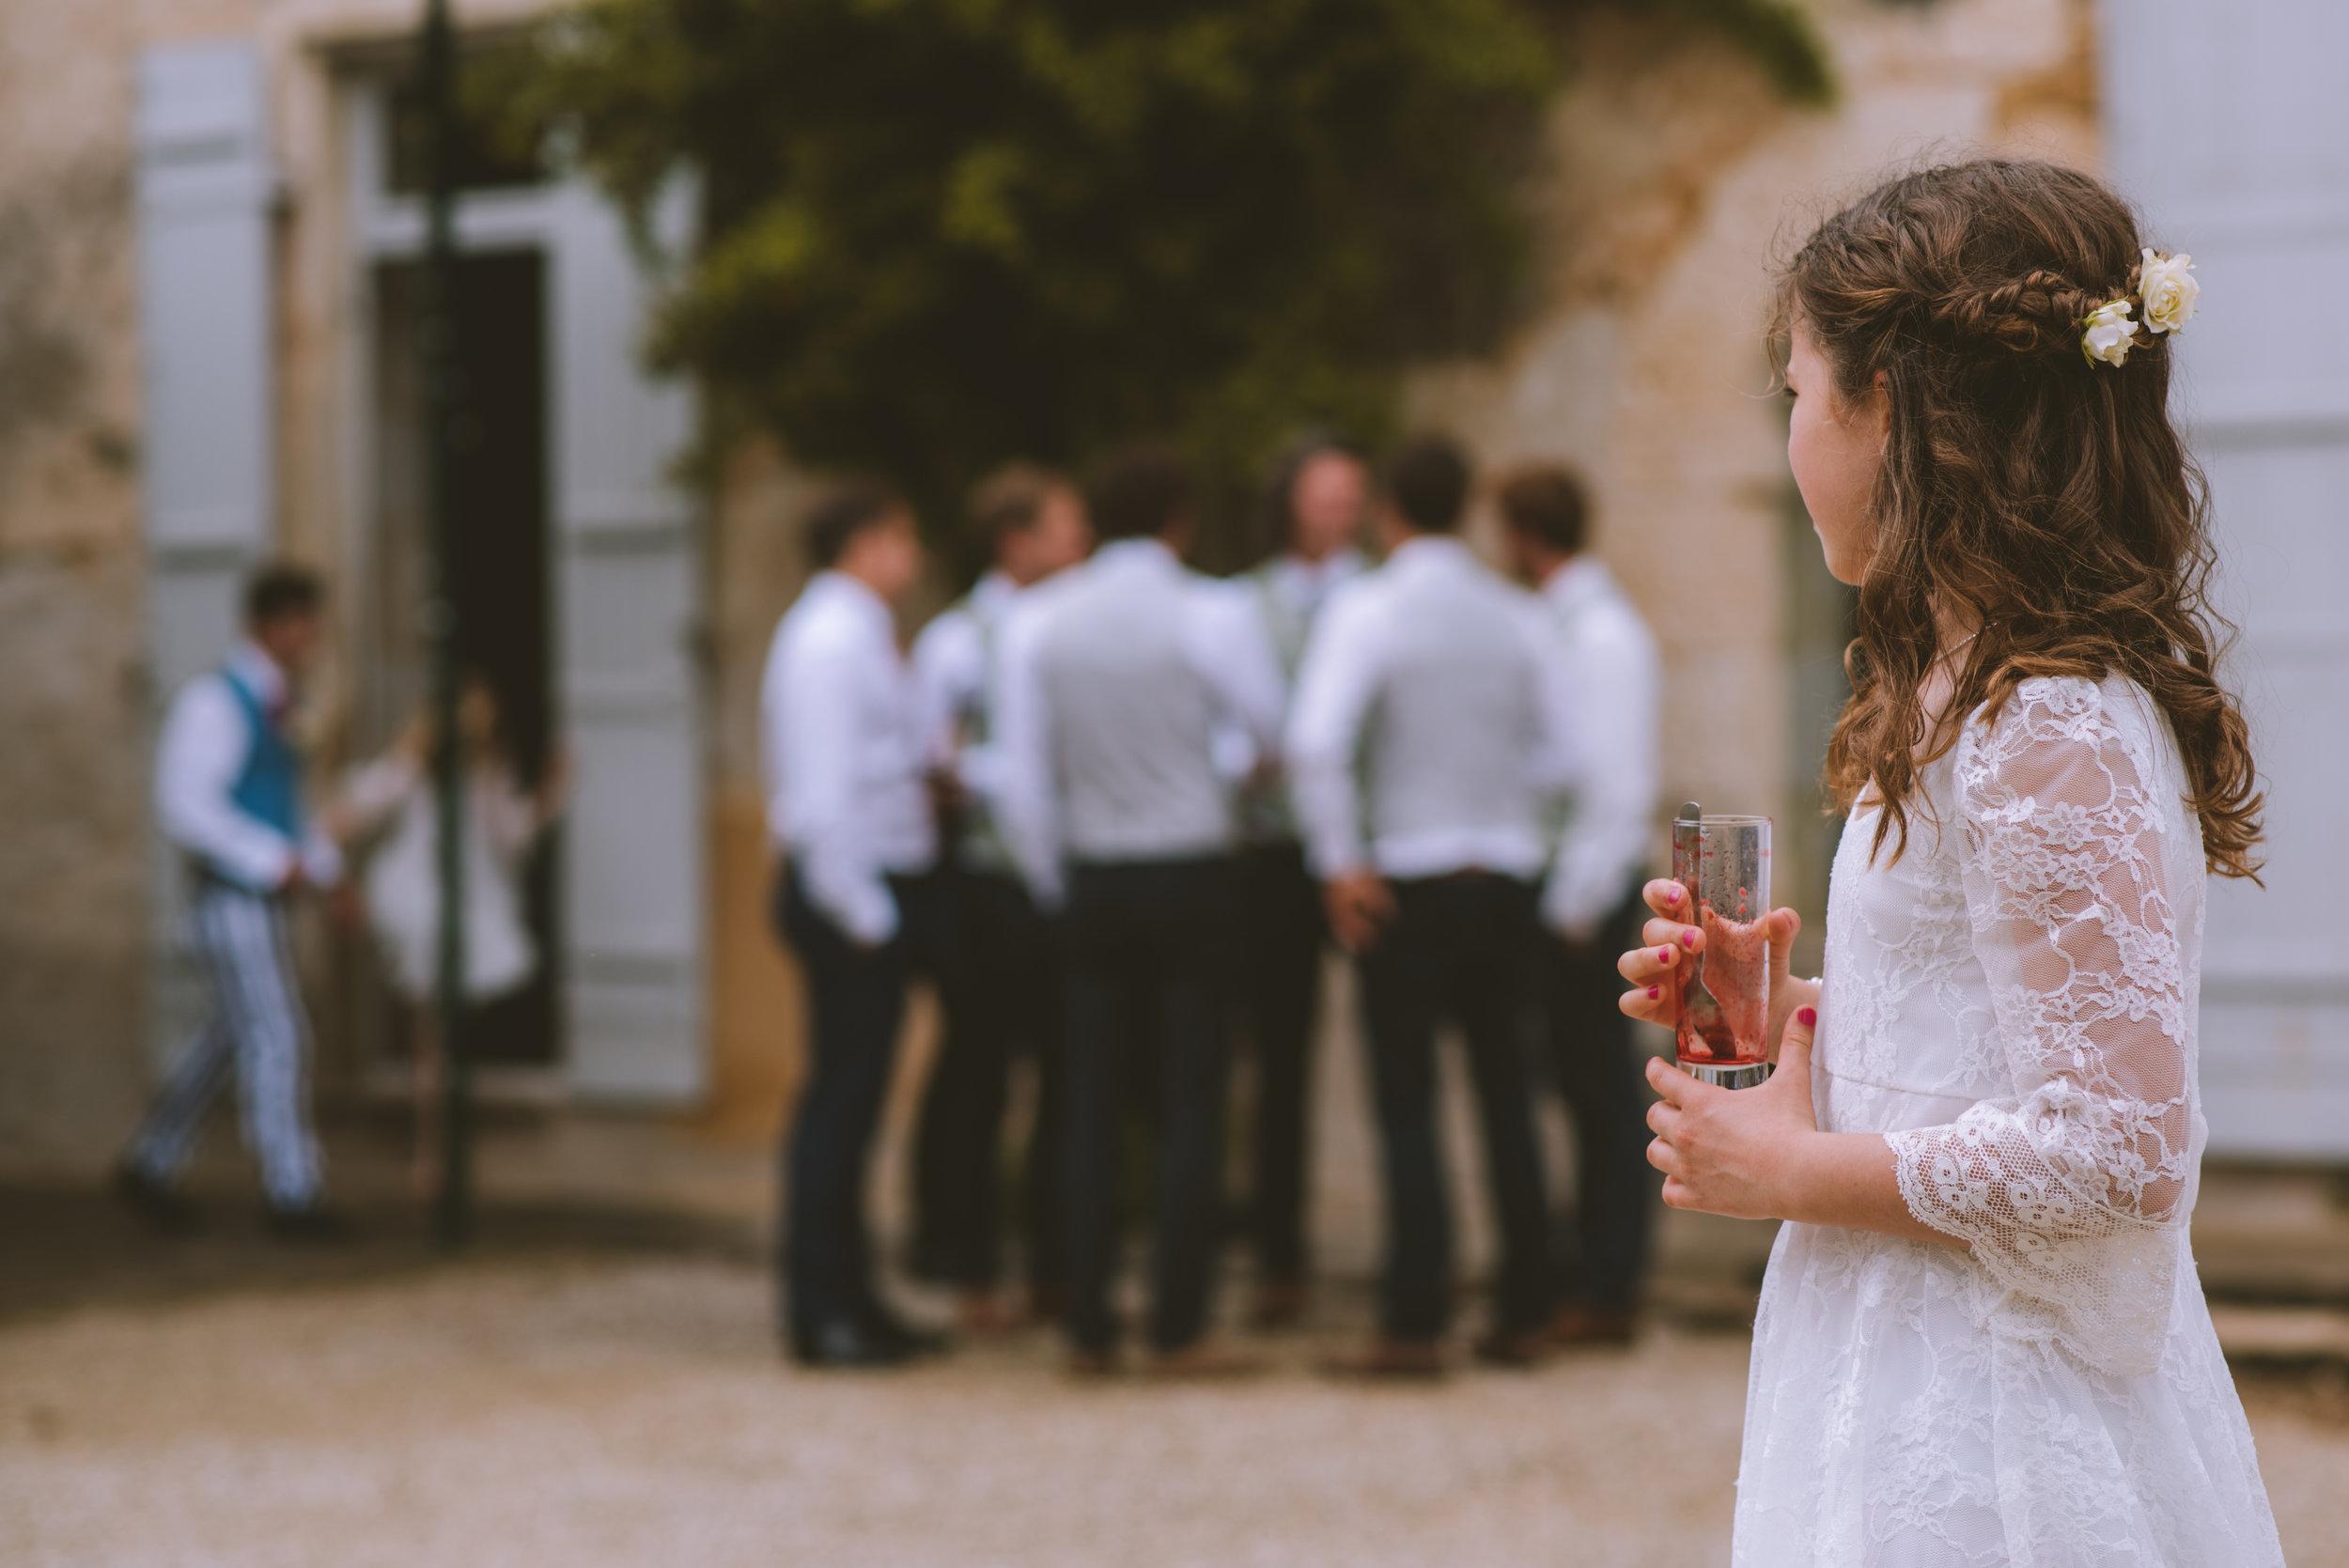 wedding-photographer-dordogne-mark-shaw-27.jpg